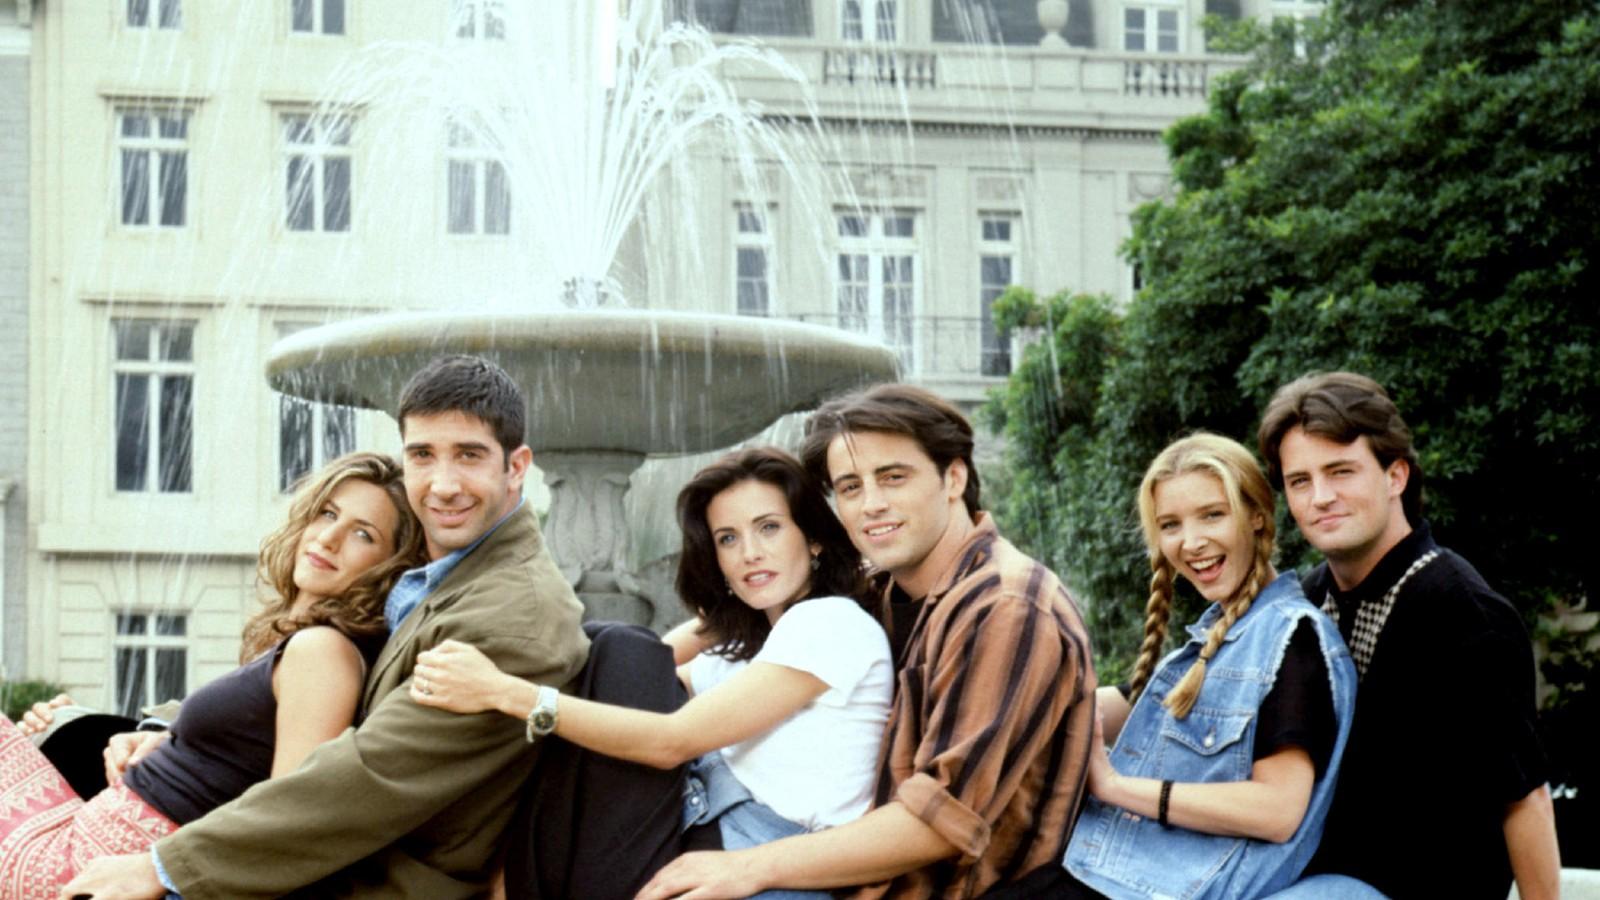 Le casting de Friends Jennifer Aniston, David Schwimmer, Courteney Cox Arquette, Matt LeBlanc, Lisa Kudrow, Matthew Perry, (Saison 1)